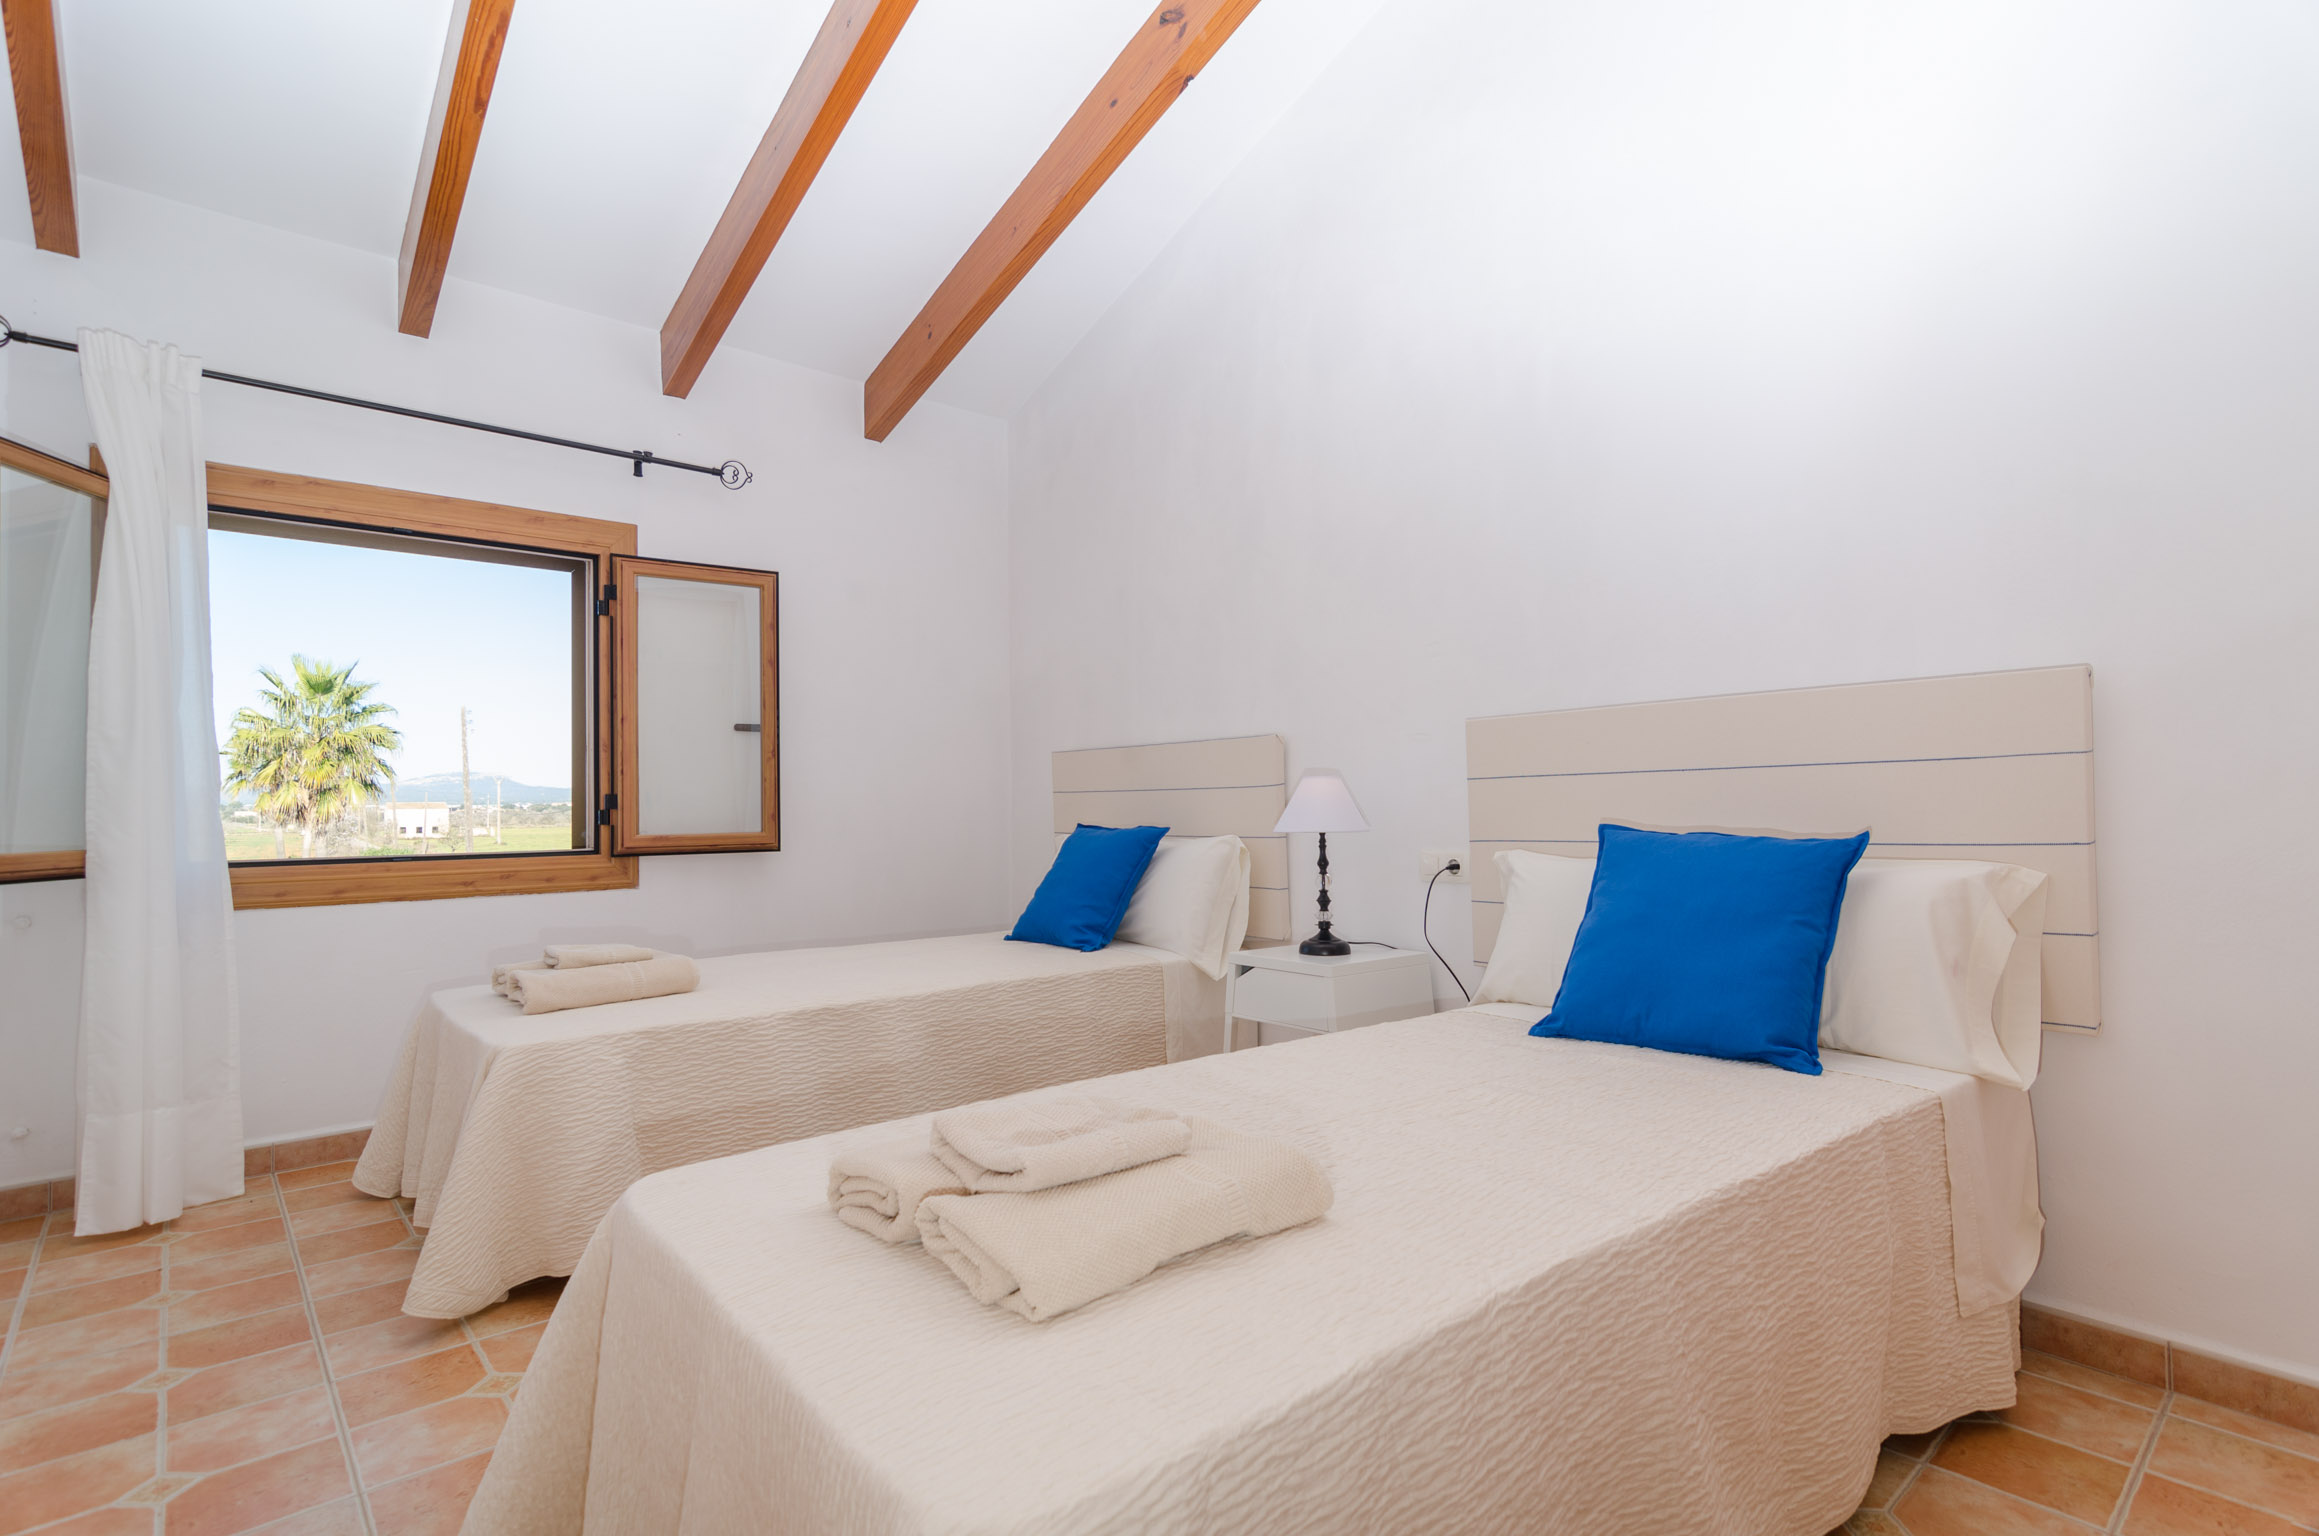 Ferienhaus SANT BLAI VELL (2284789), Campos, Mallorca, Balearische Inseln, Spanien, Bild 19